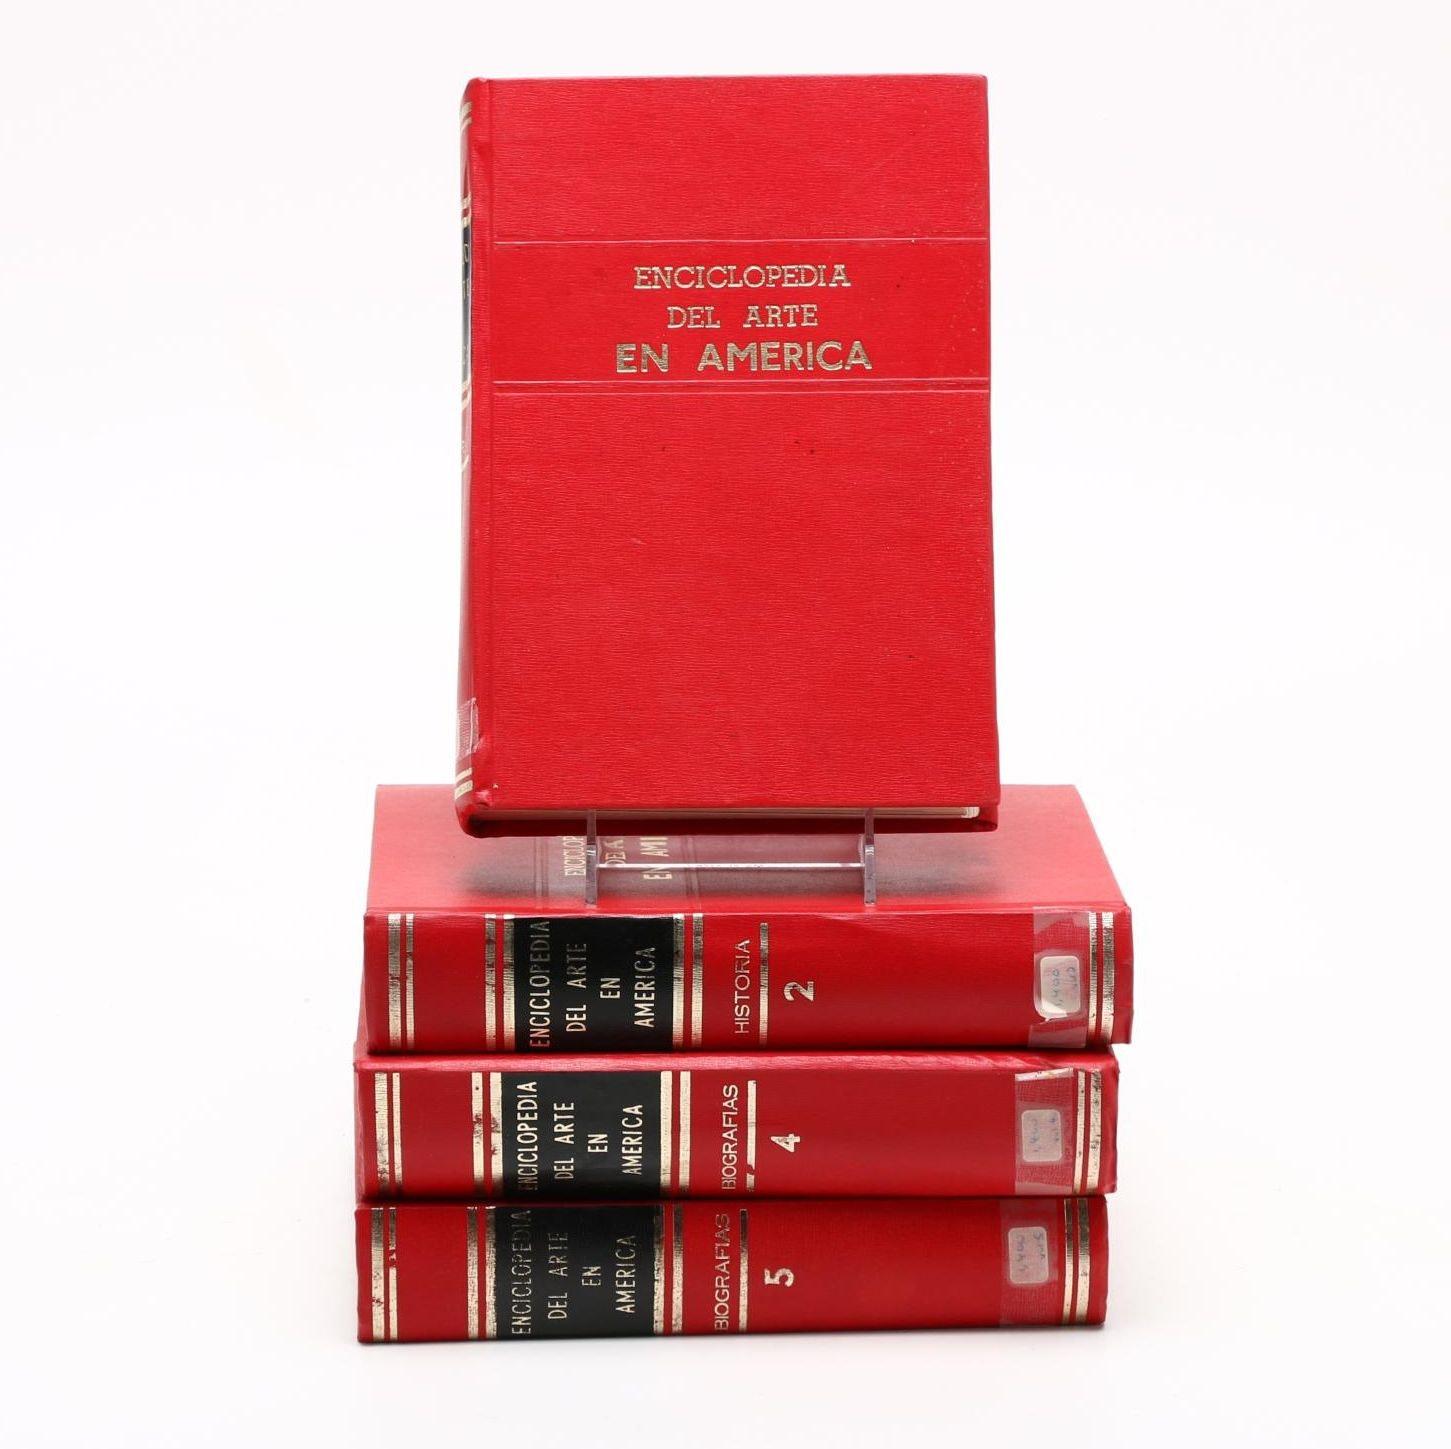 """Enciclopedia del Arte en America"" Four Volume Set"